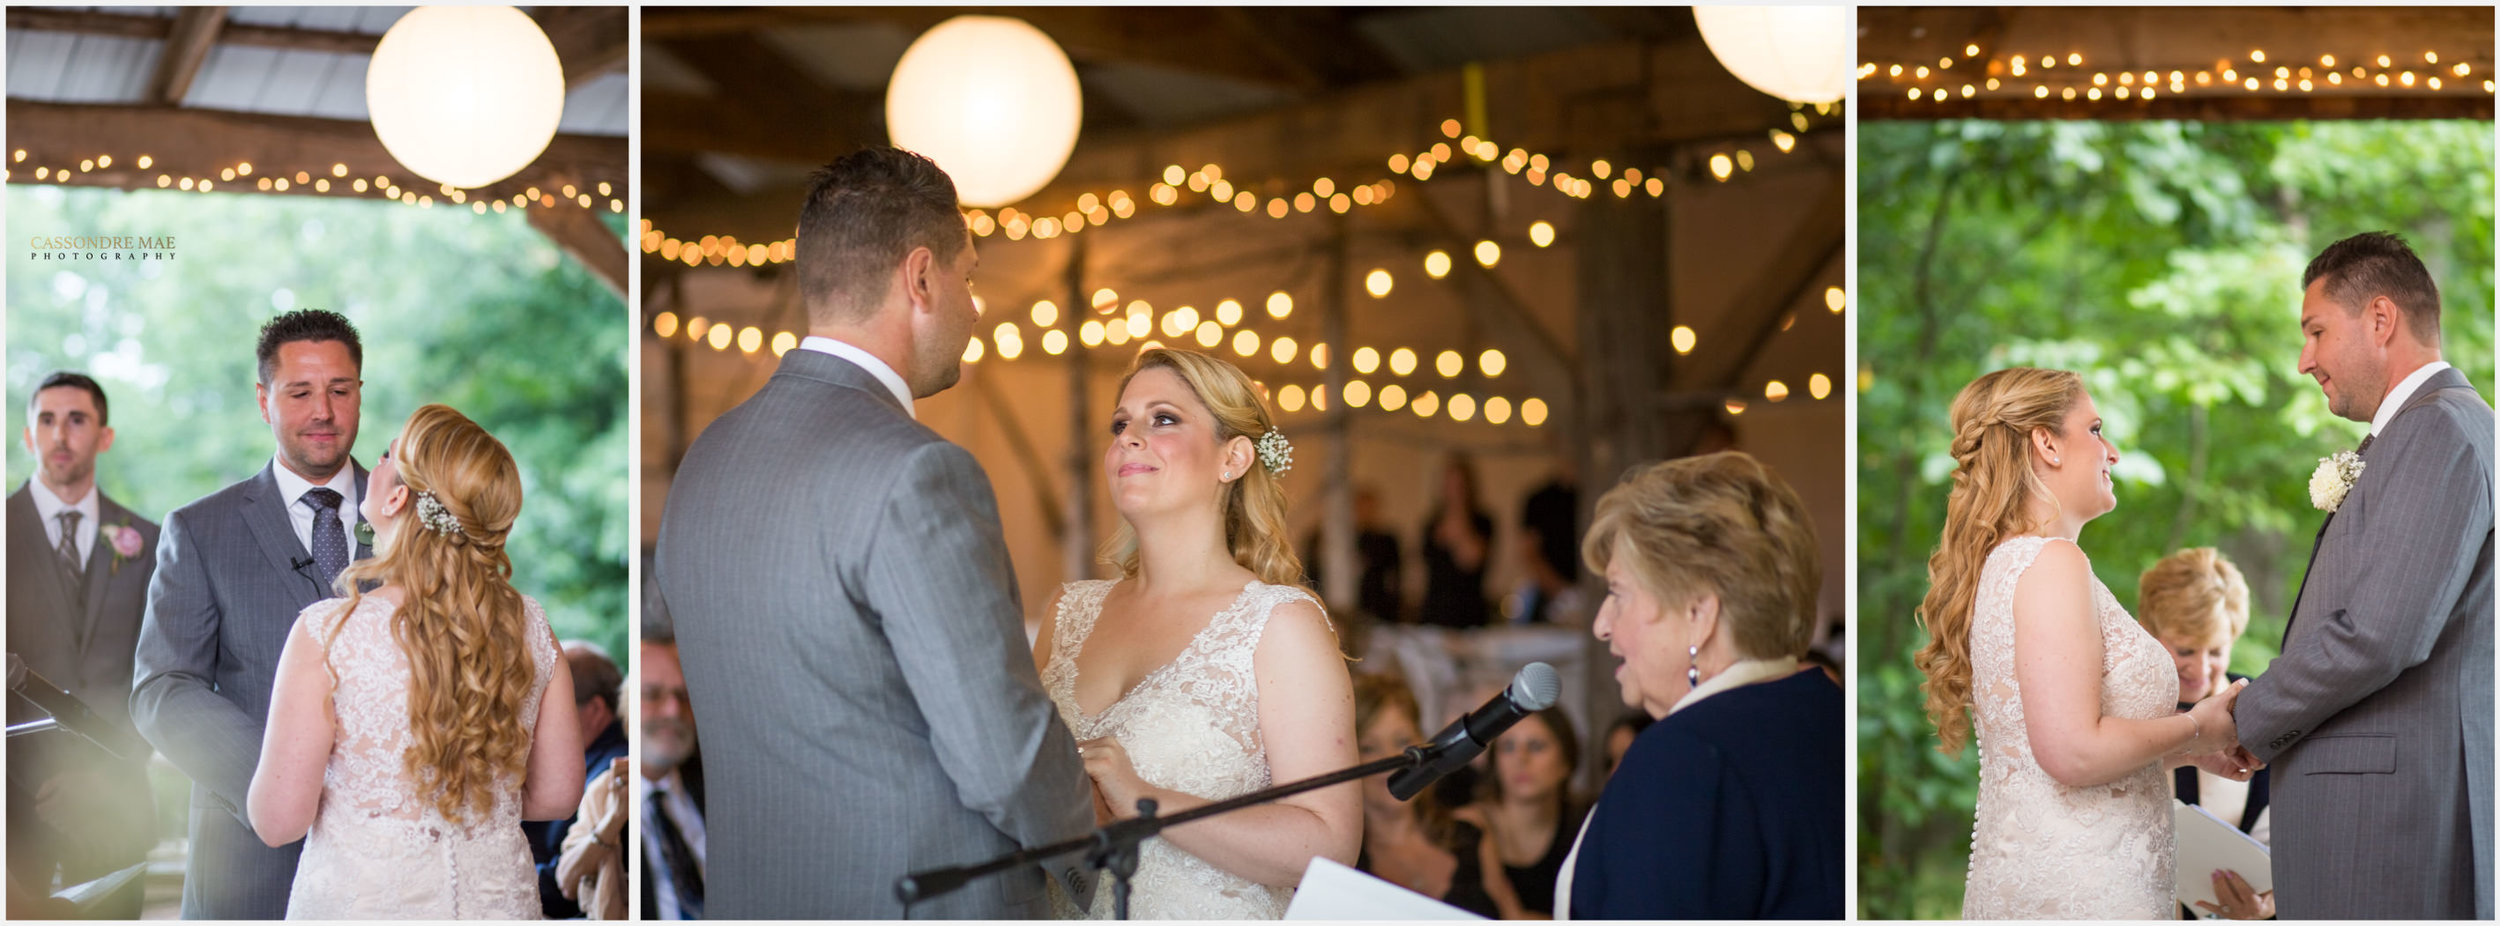 Cassondre Mae Photography Emmerich Tree Farm Wedding 17.jpg